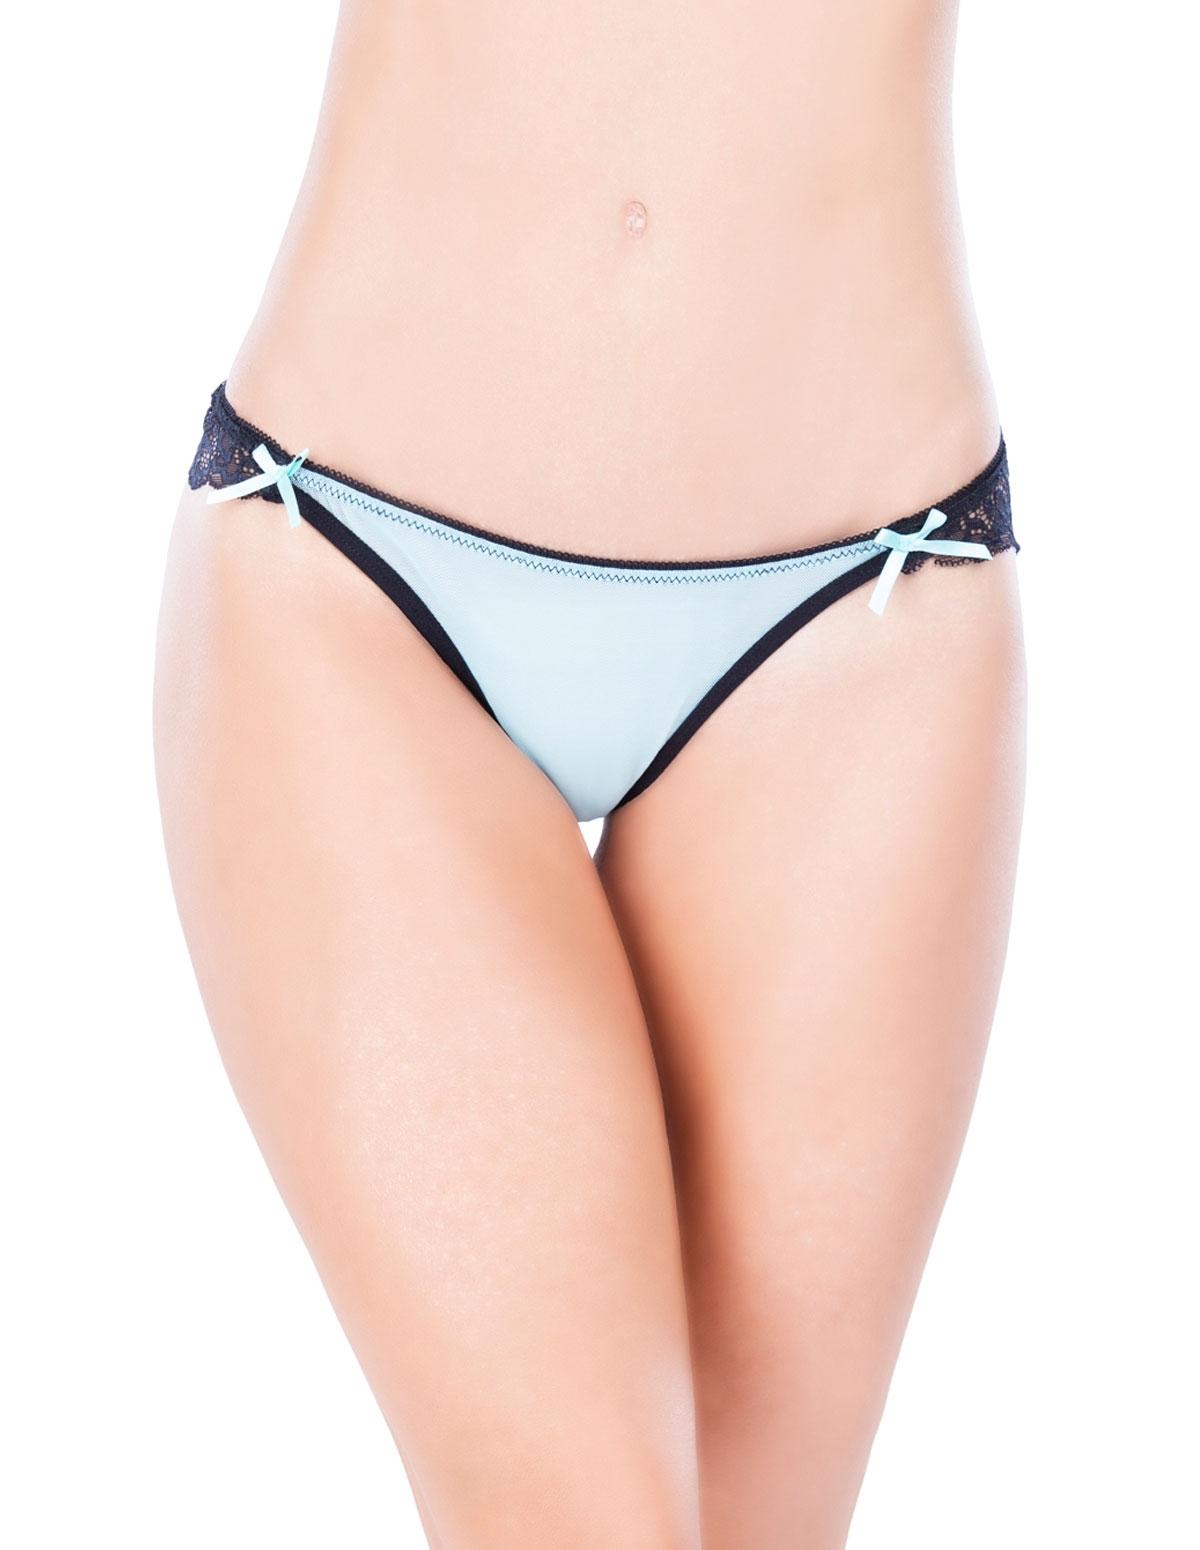 Put A Bow On It Crotchless Panty - Reg & Plus